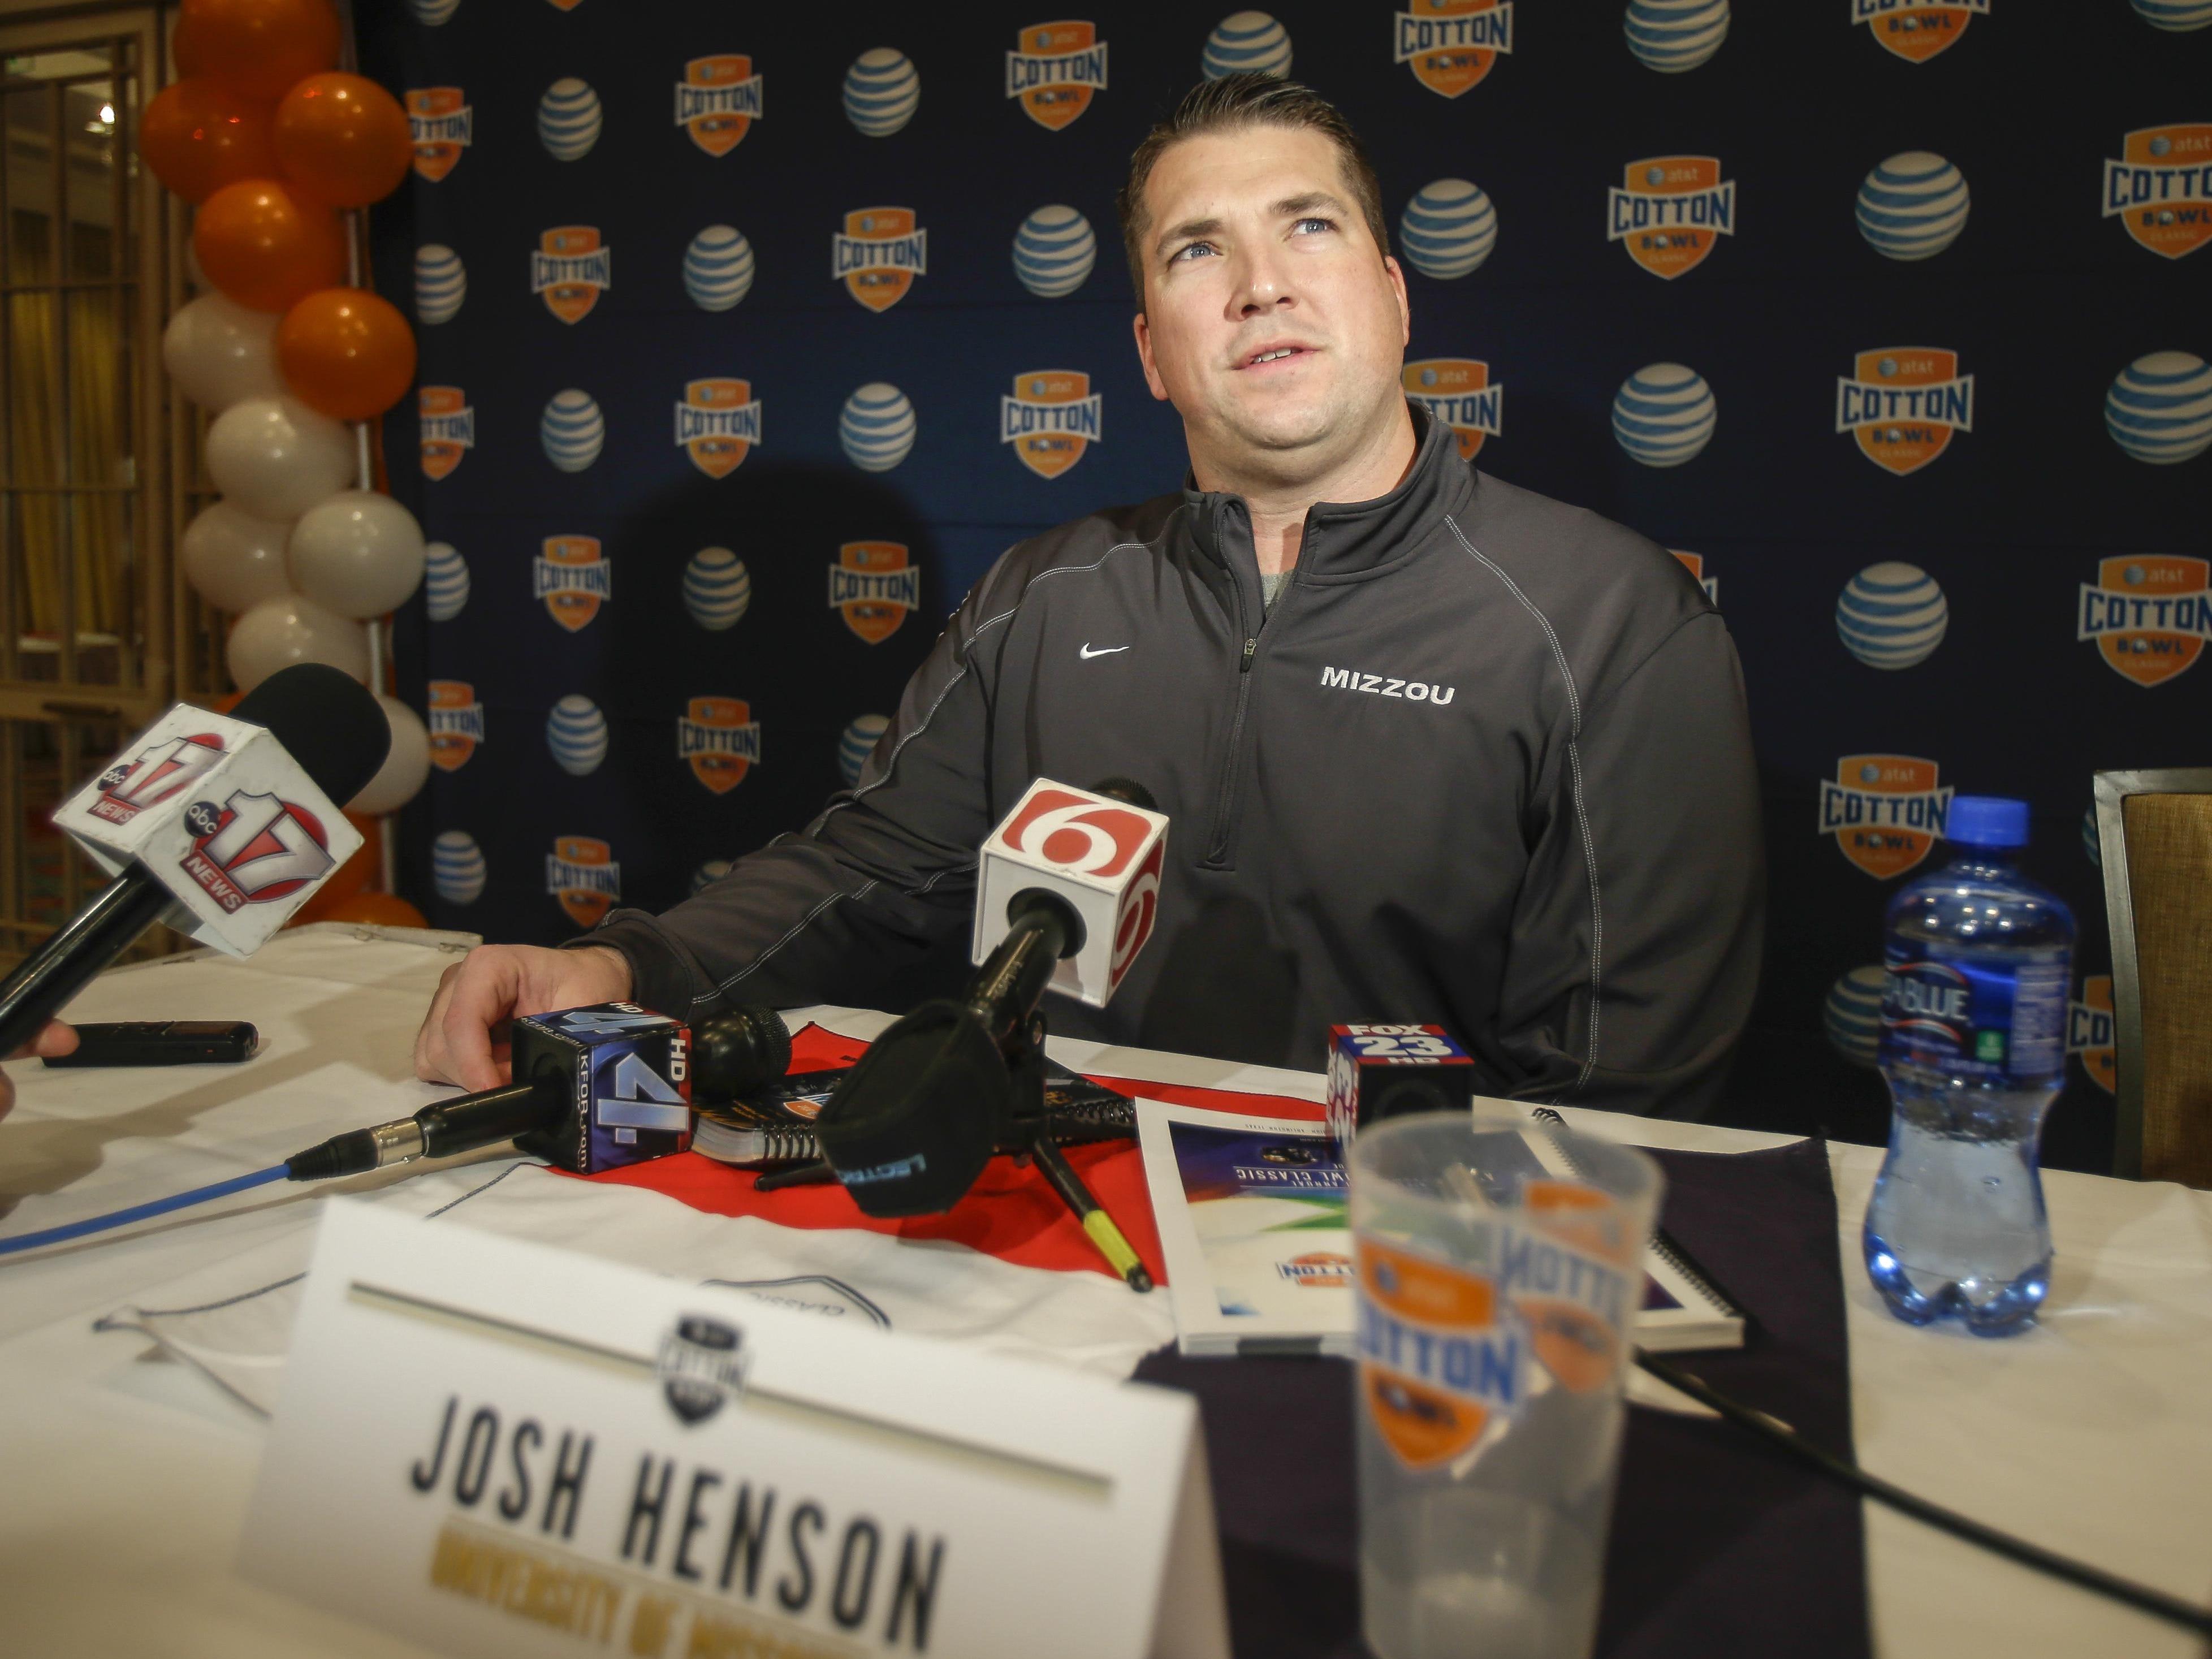 Missouri offensive coordinator Josh Henson was shocked by Gary Pinkel's decision to step down.